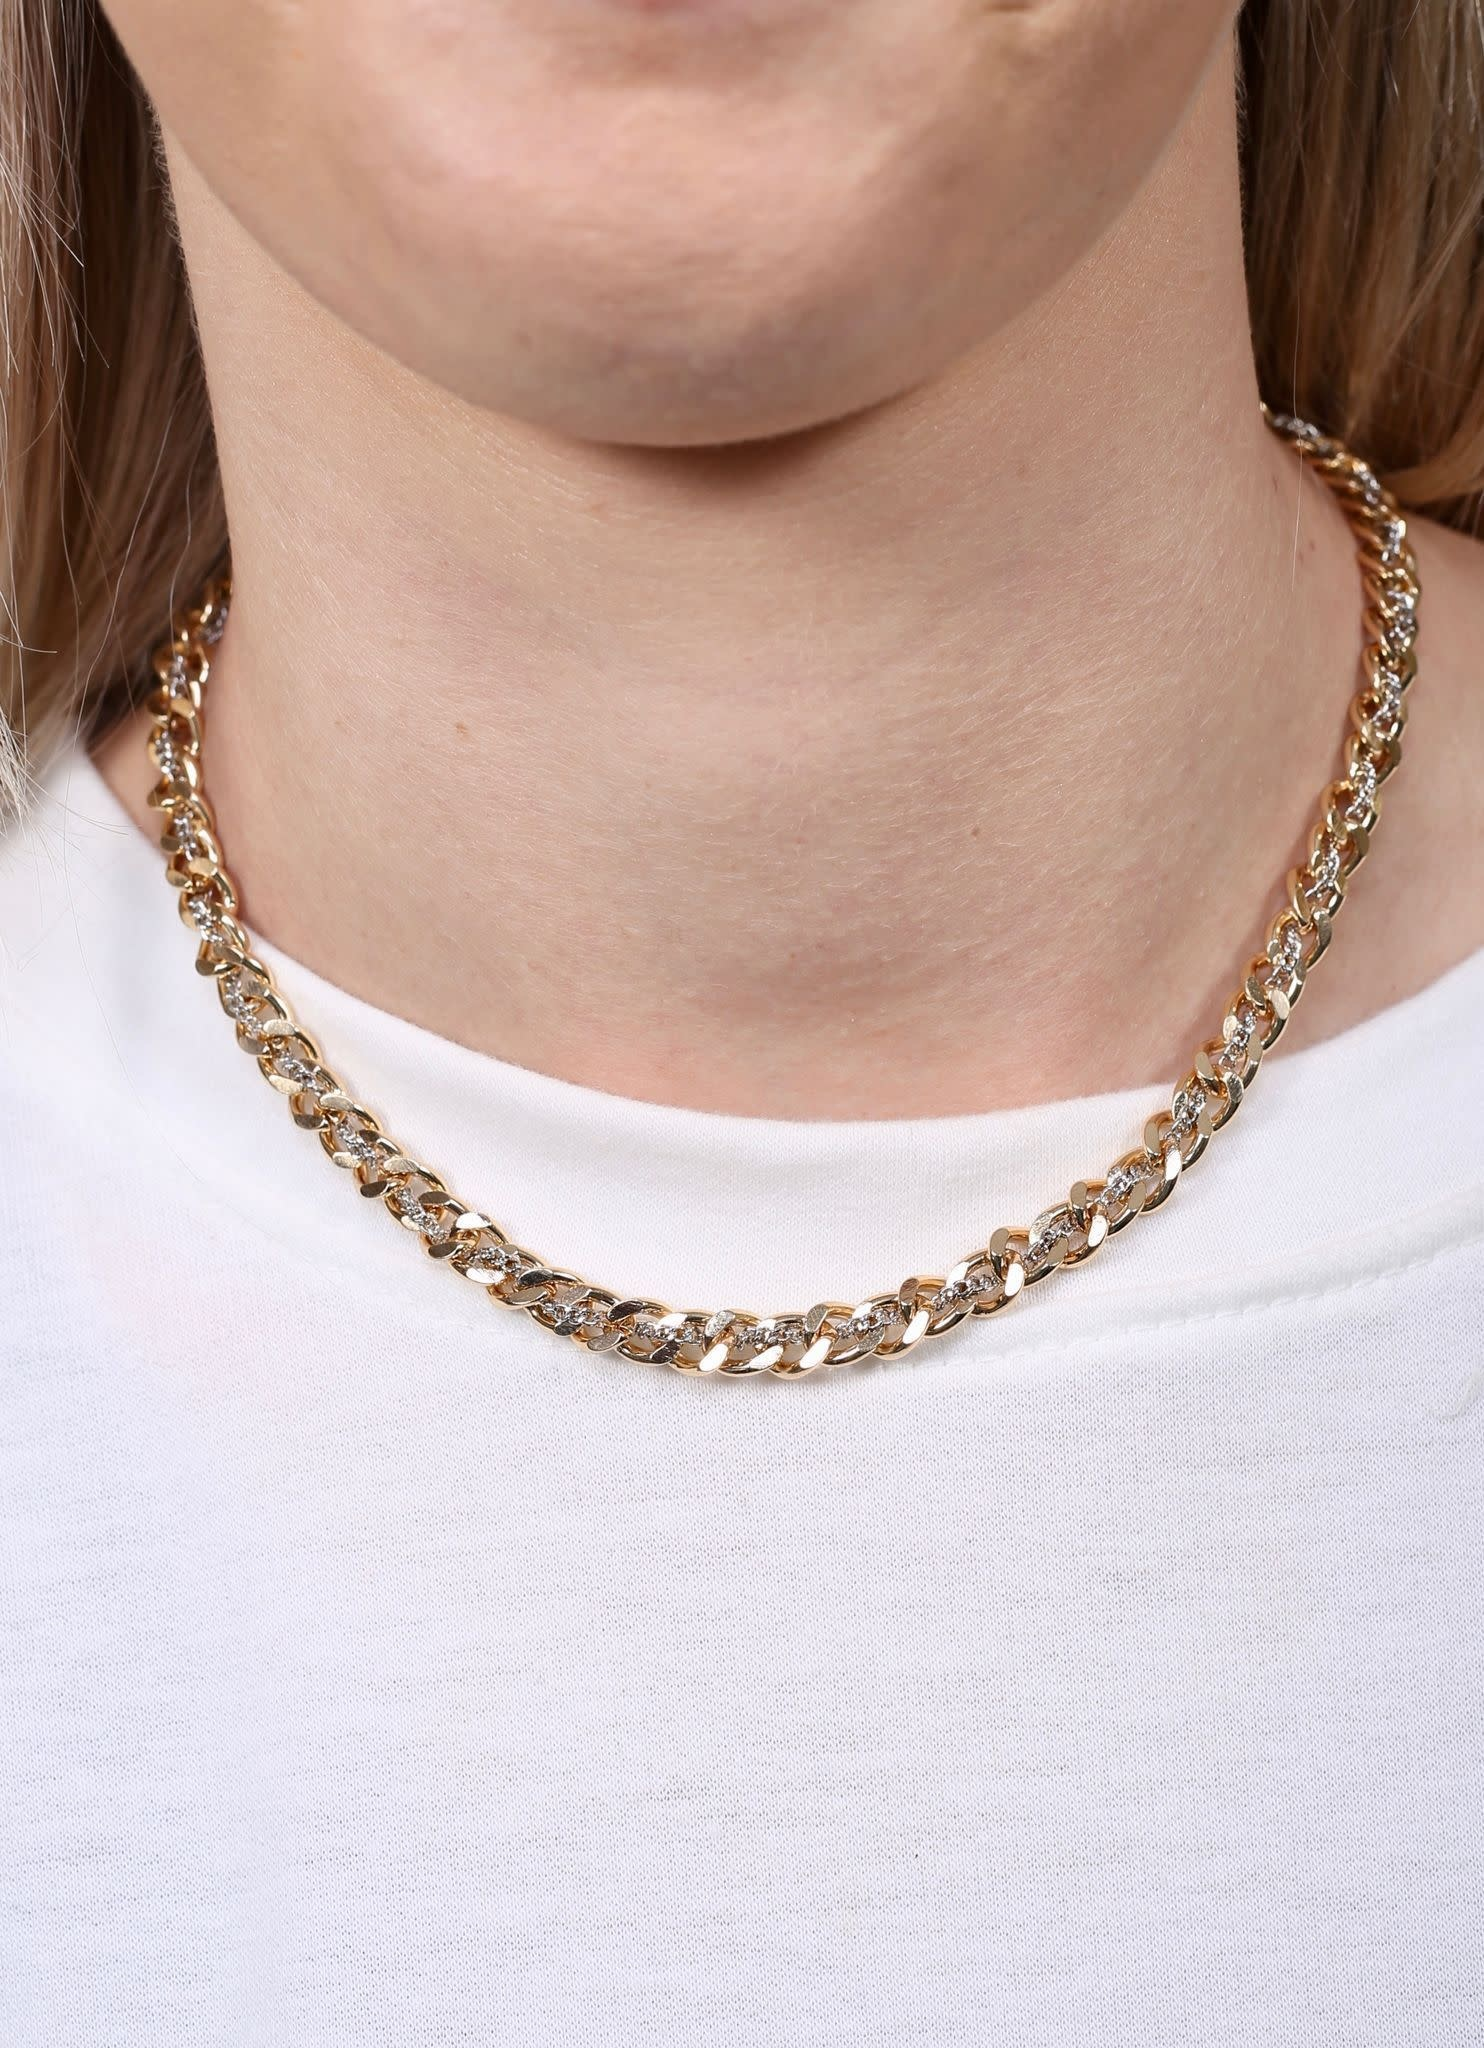 Caroline Hill Rafe Dual Tone Chain Link Necklace